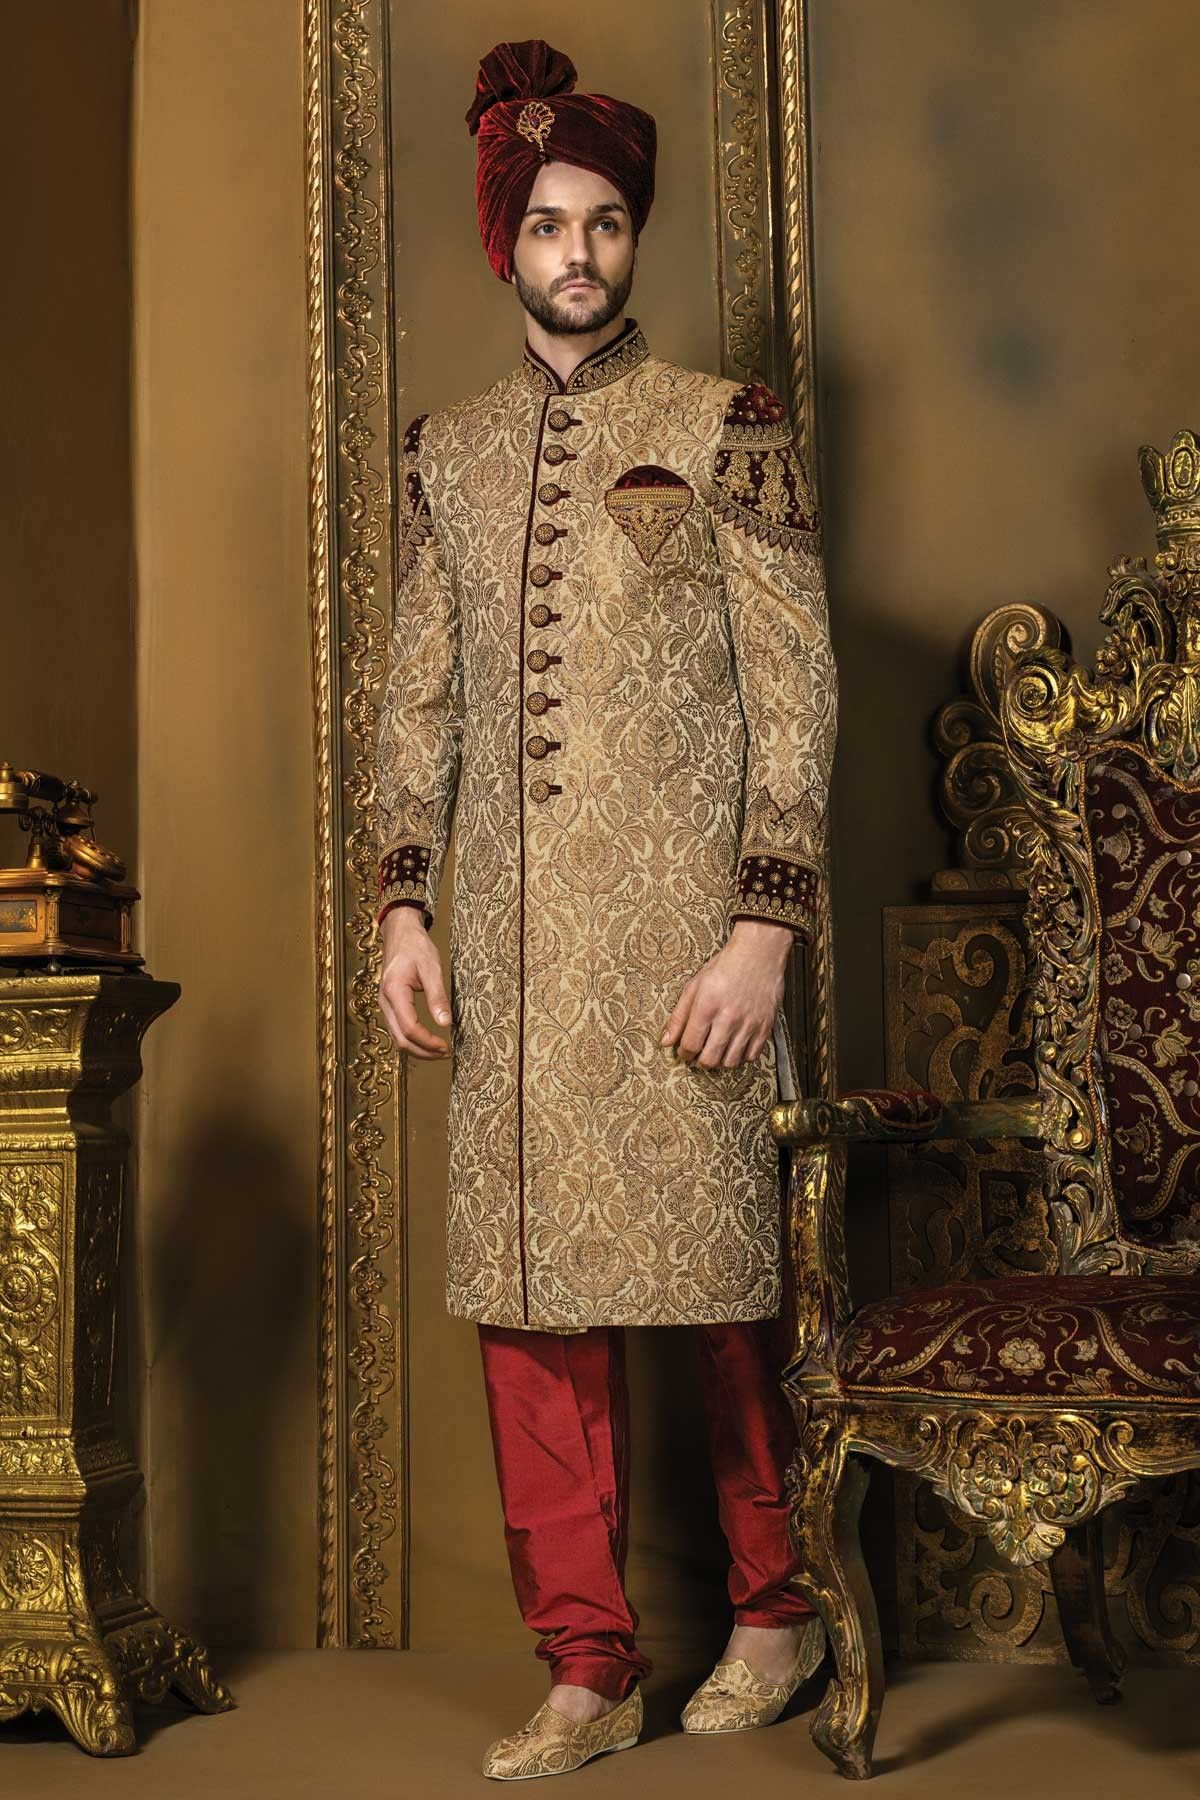 Matt gold u maroon khinkwab u velvet bandh gala dashing sherwani